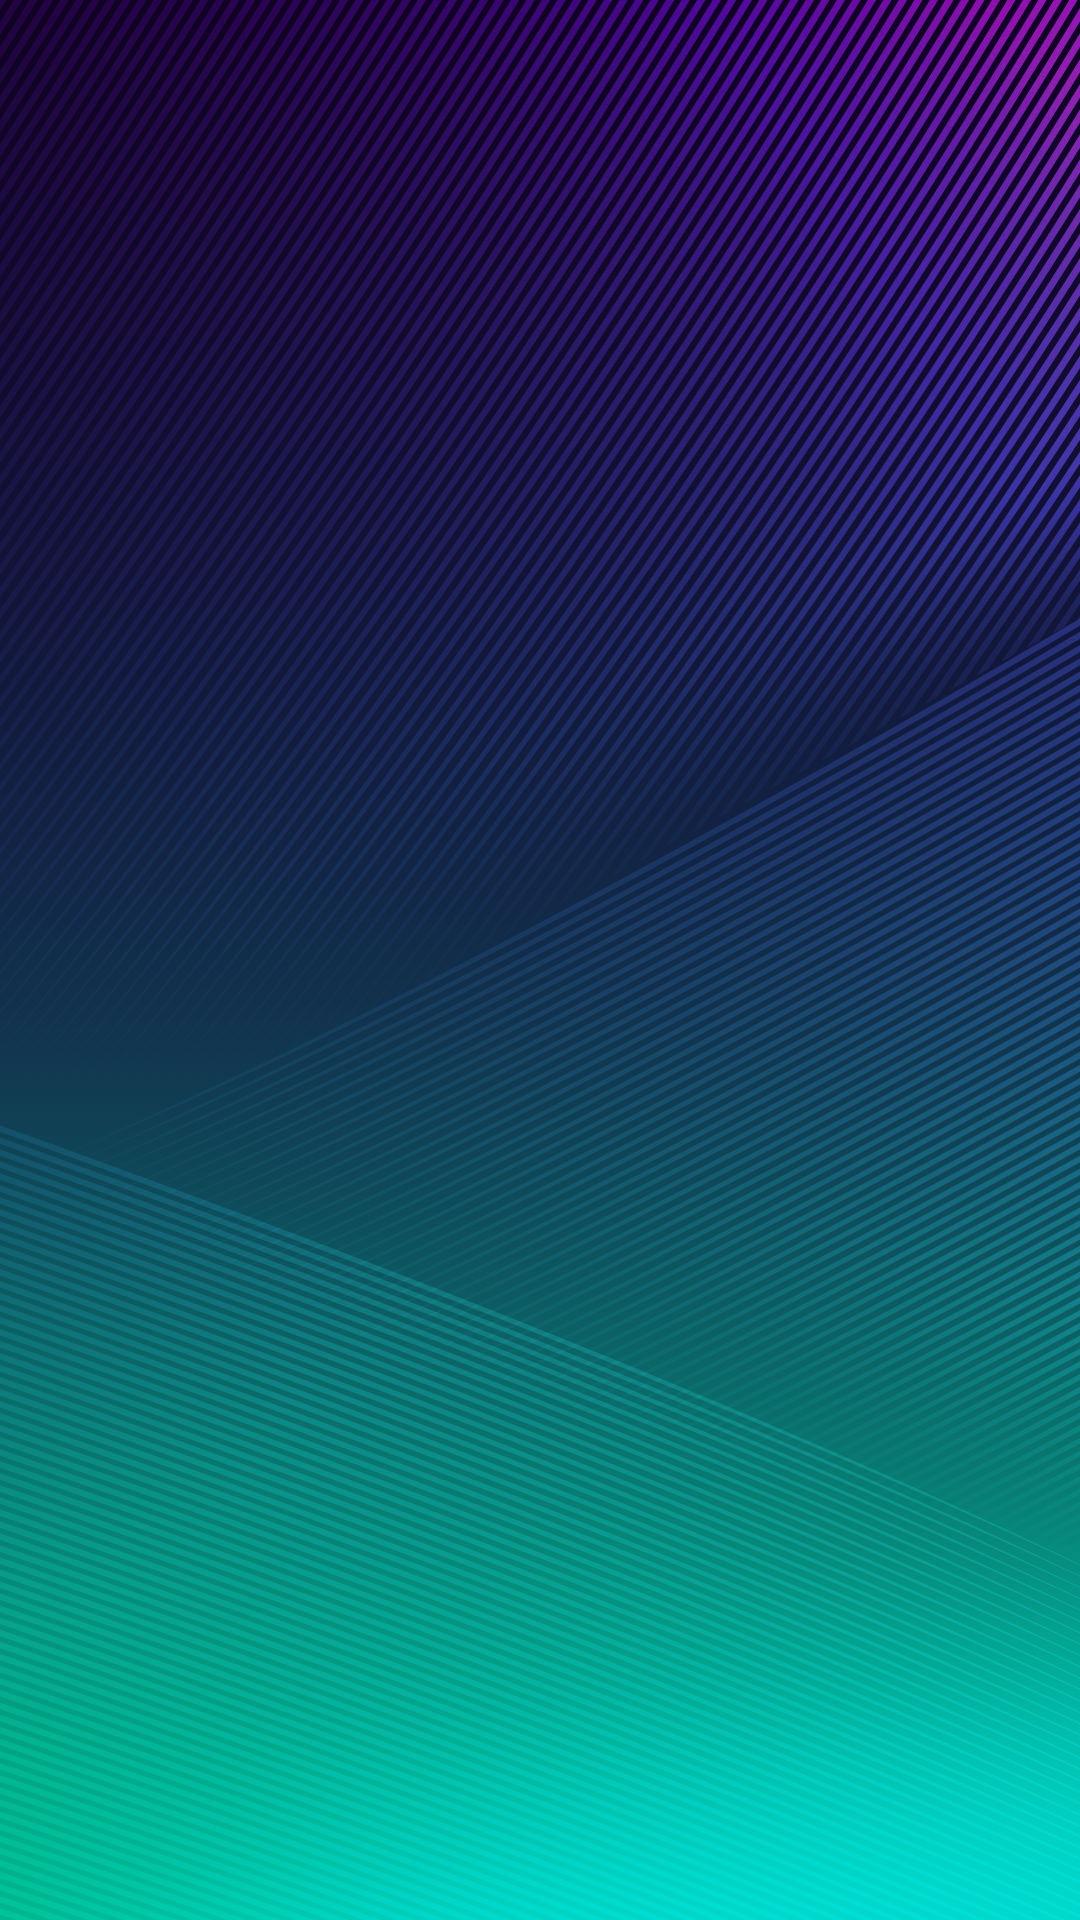 Lenovo Vibe iPhone Wallpaper iphoneswallpapers com